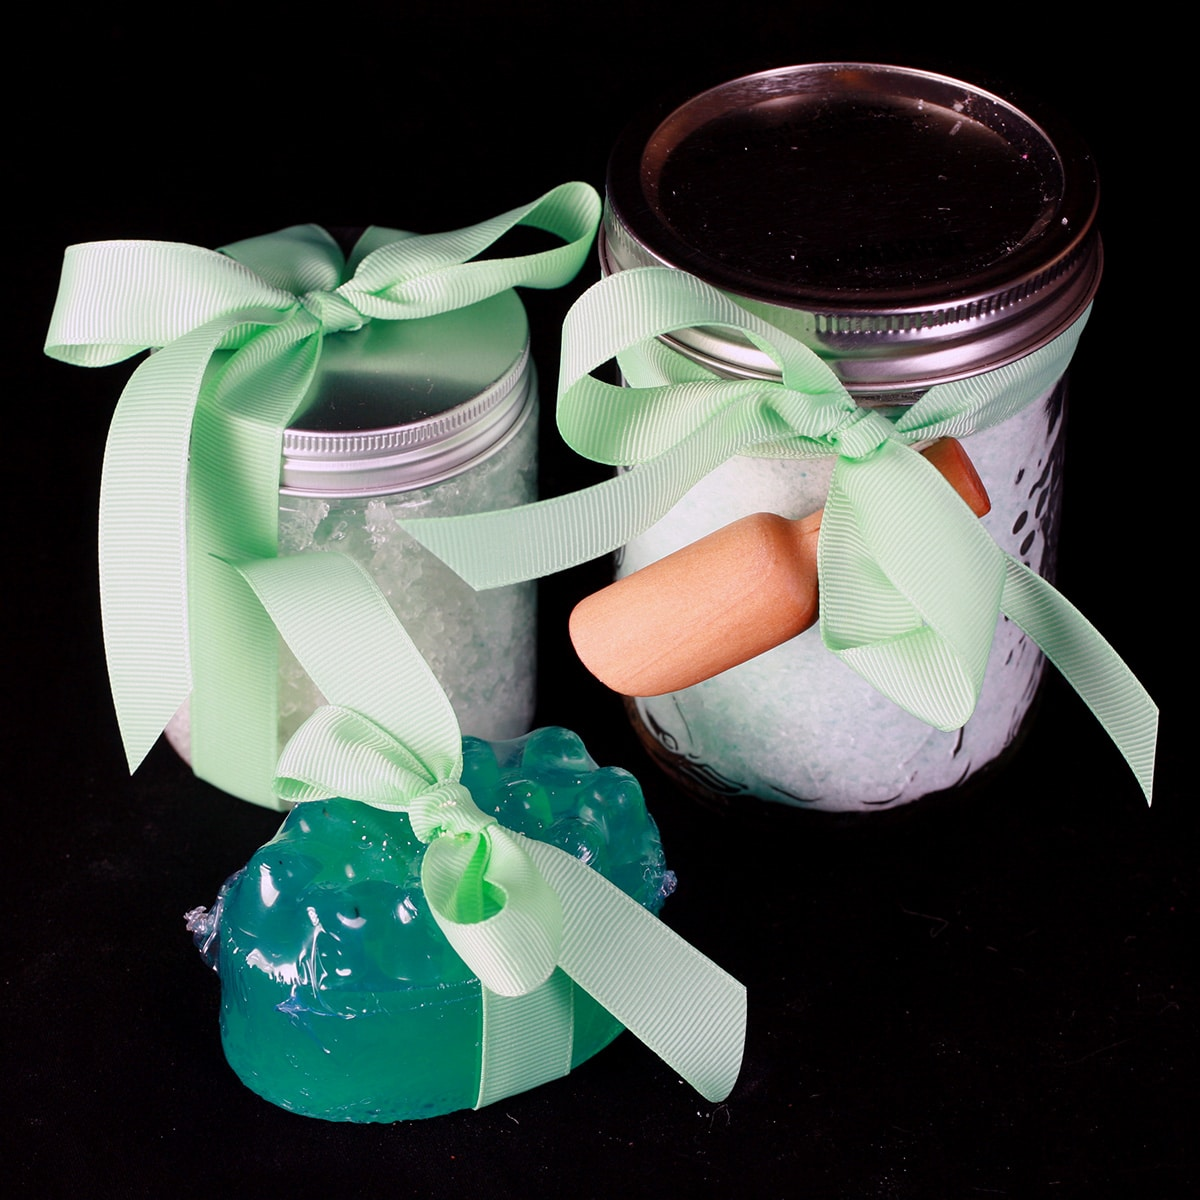 A three piece peppermint-eucalyptus bath set - bath salt, salt scrub, and a soap. Each is wrapped with a light green bow.